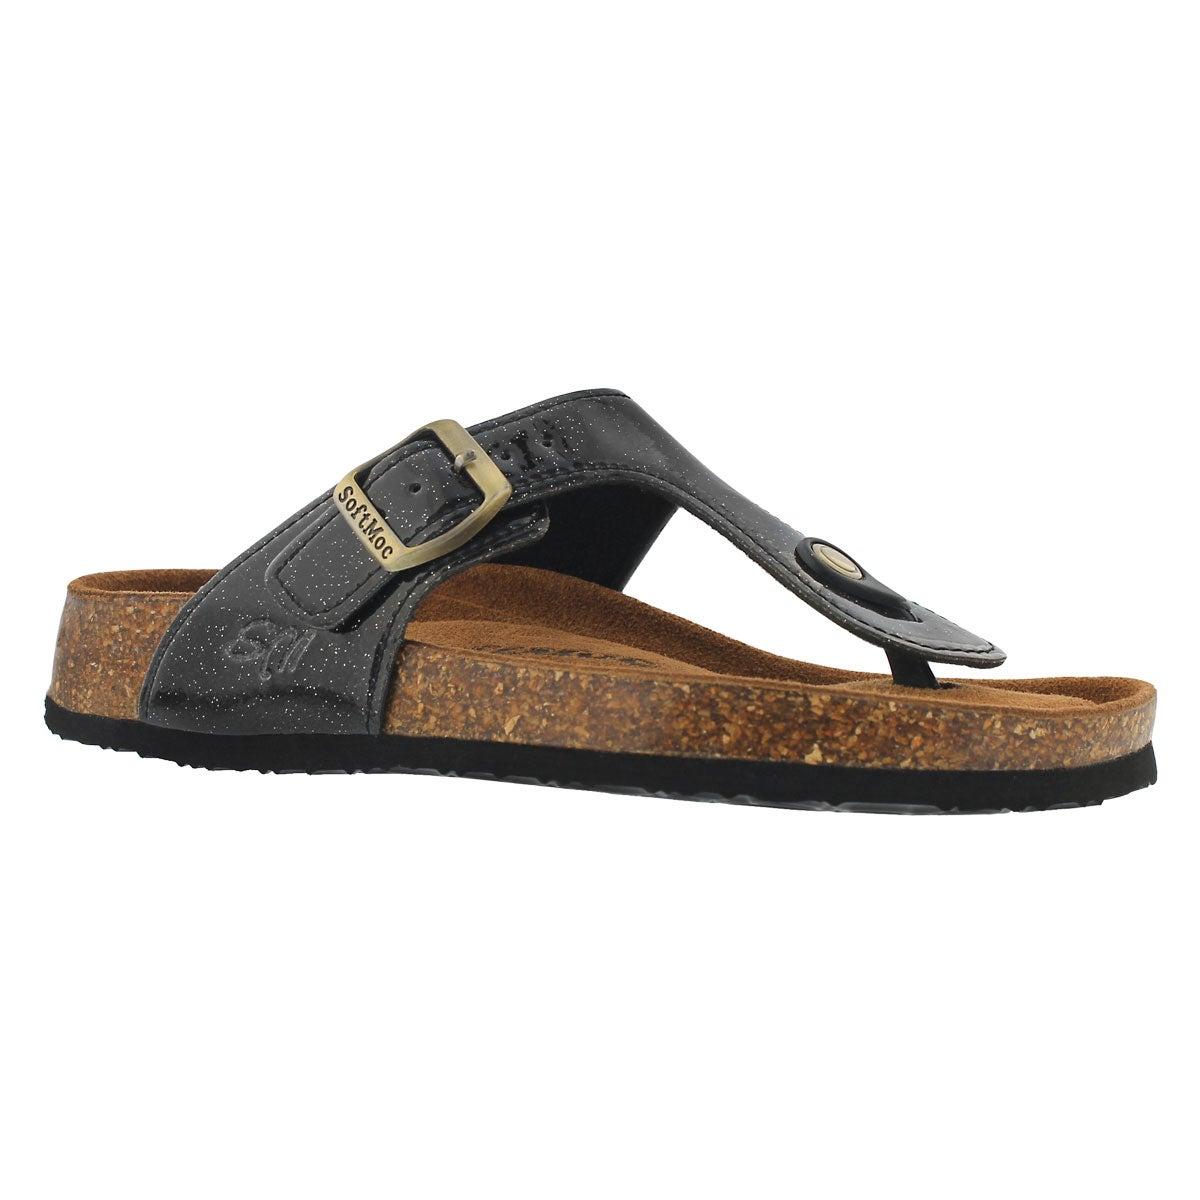 Women's ANGY 5 bk glt memory foam thong sandals